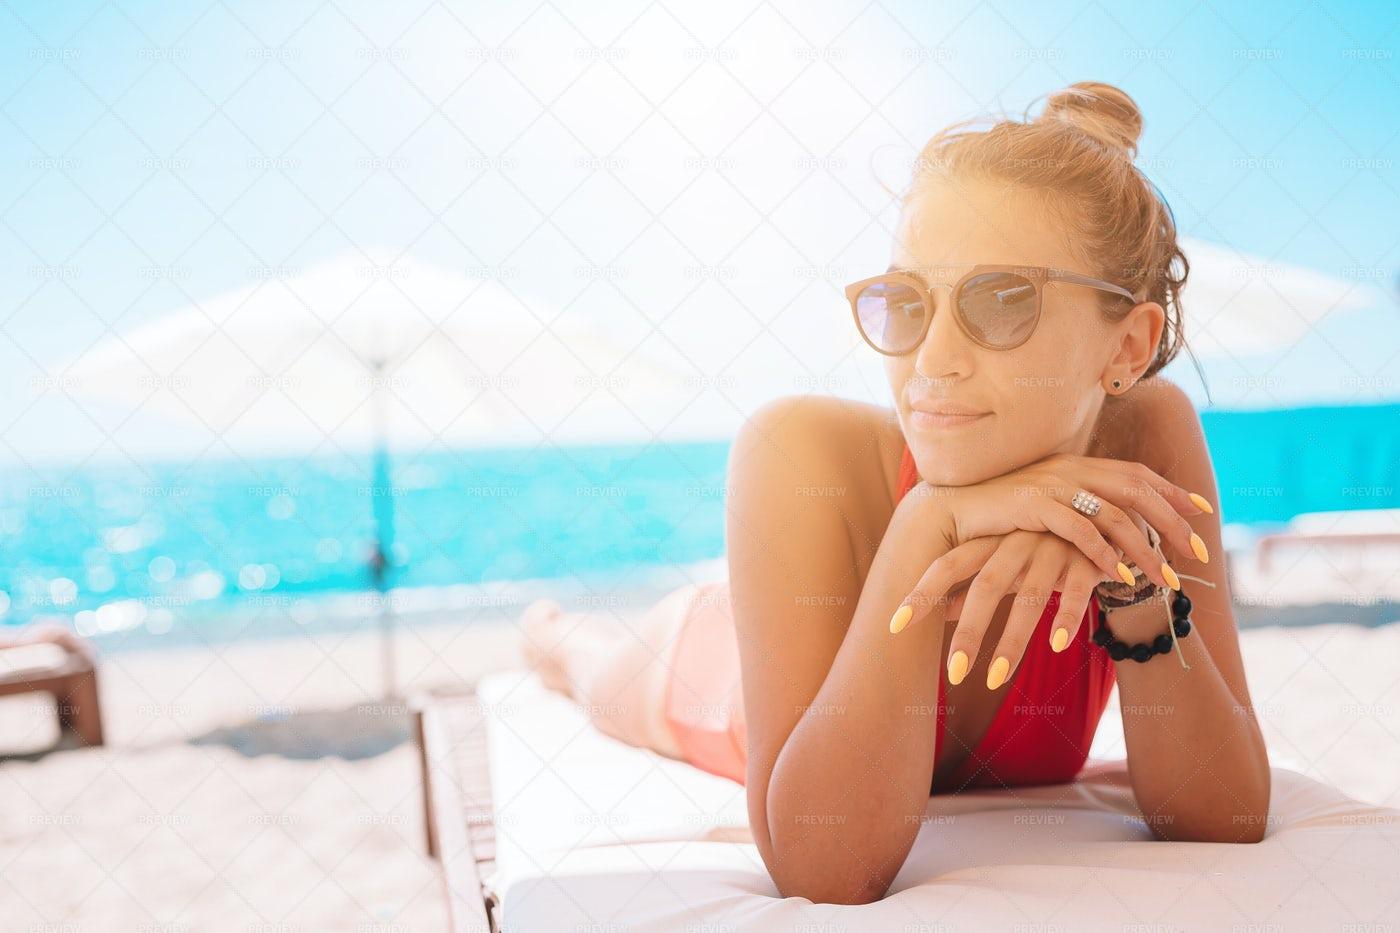 Woman On A Sun Bed: Stock Photos